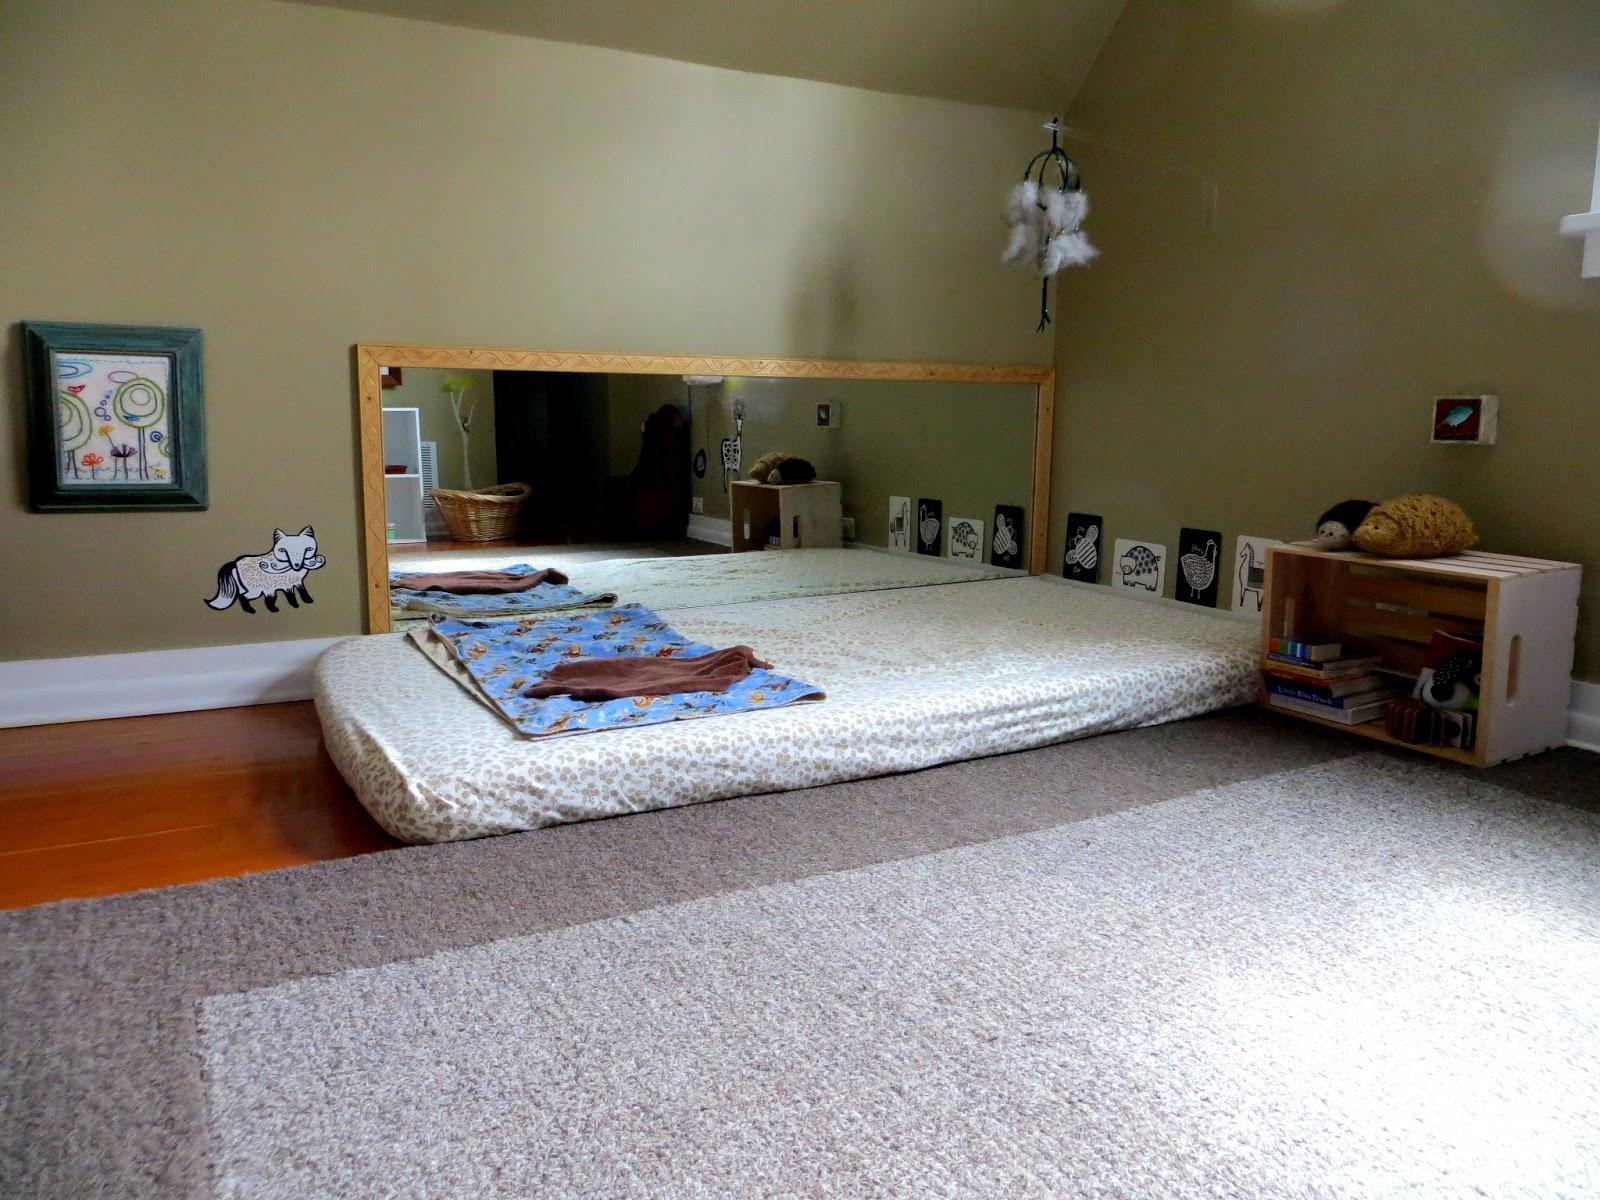 ⚛⚛⚛Exemple de chambre Montessori en photo ⚛⚛⚛